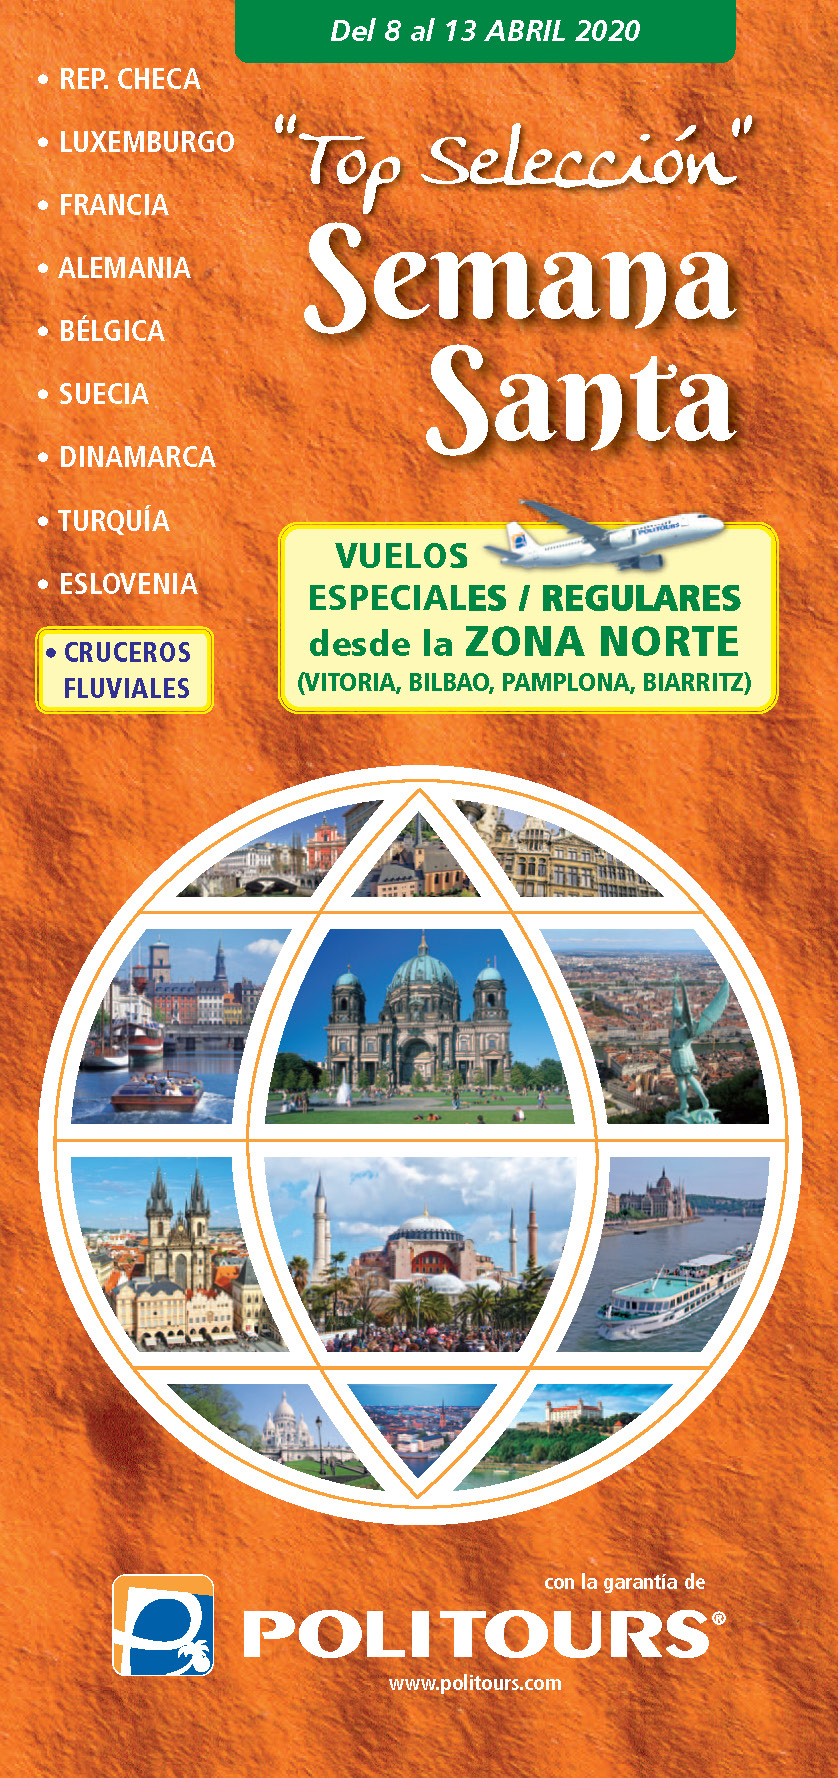 Catalogo Politours Semana Santa 2020 salidas desde Bilbao Vitoria Pamplona y Biarritz